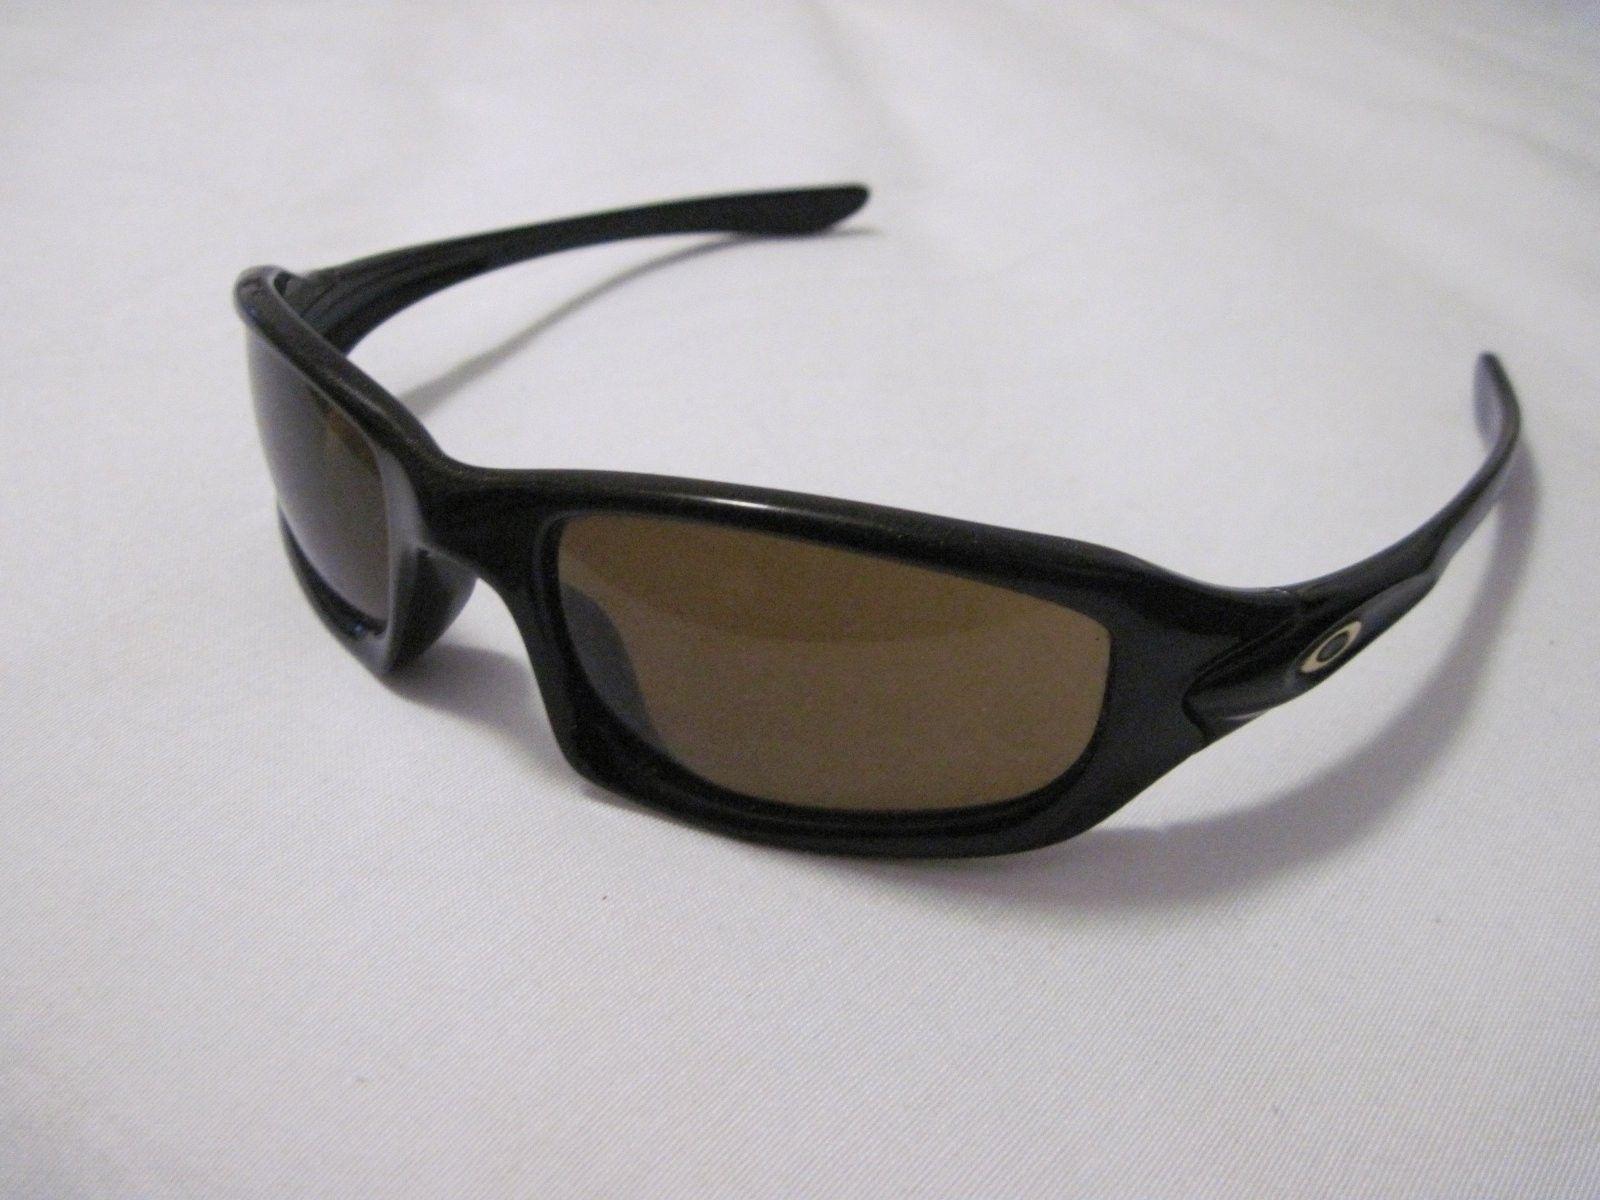 Need Help Identifying What Model Sunglasses - IMG_1408.JPG